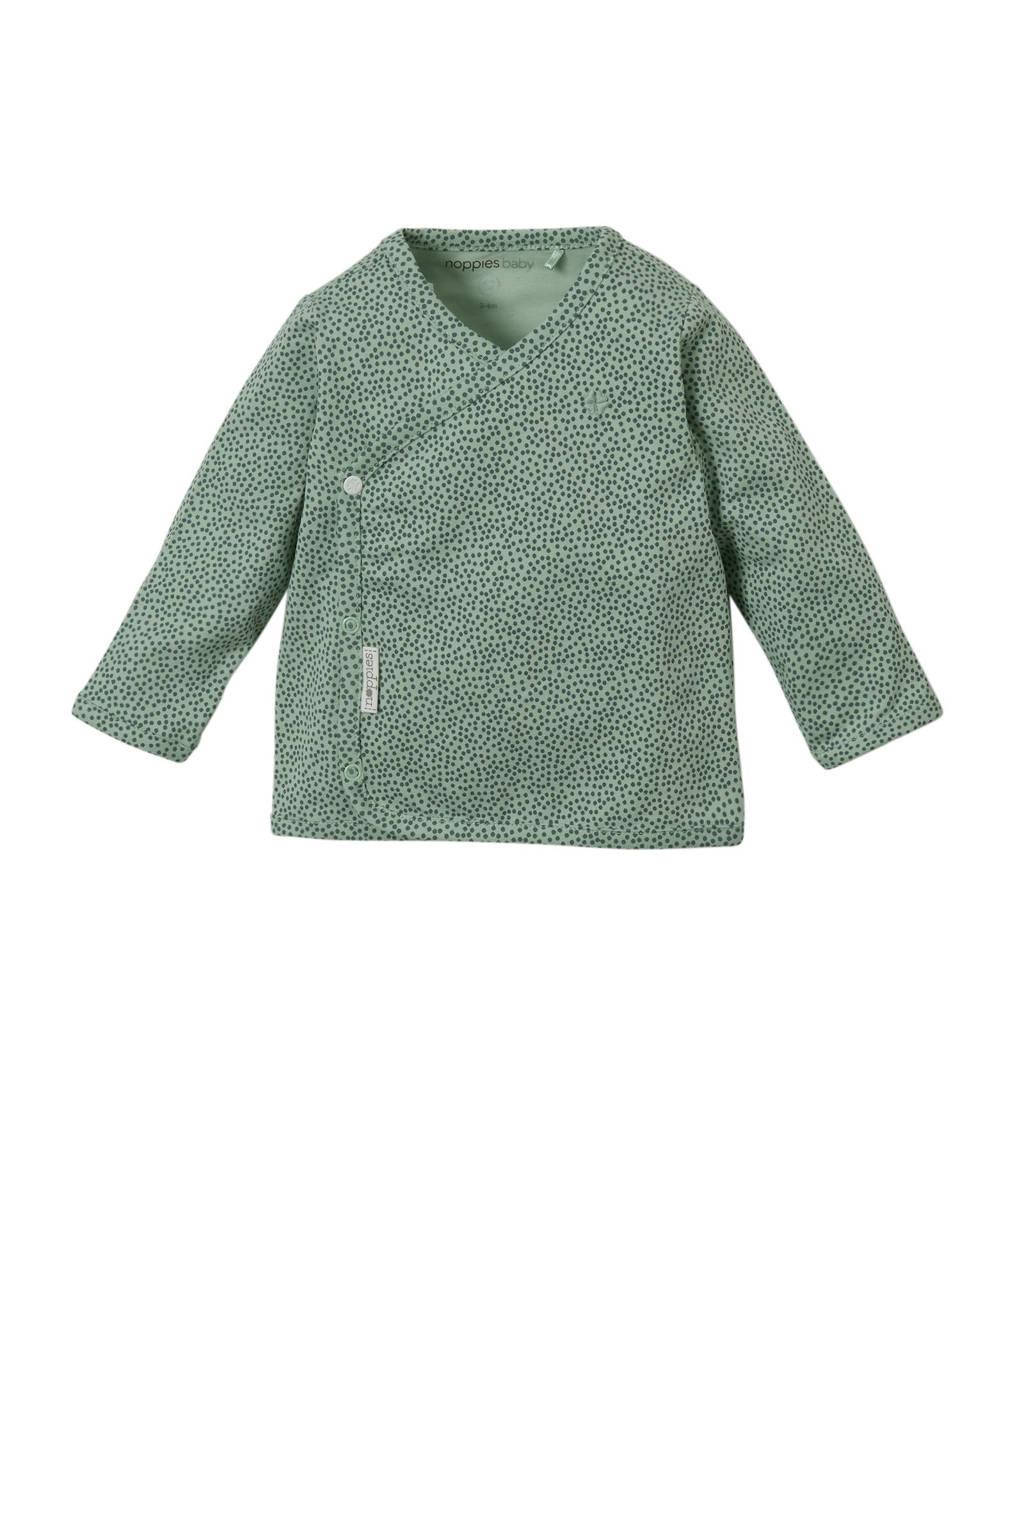 Noppies baby T-shirt Hannah met stippen mintgroen, Mintgroen/grijs